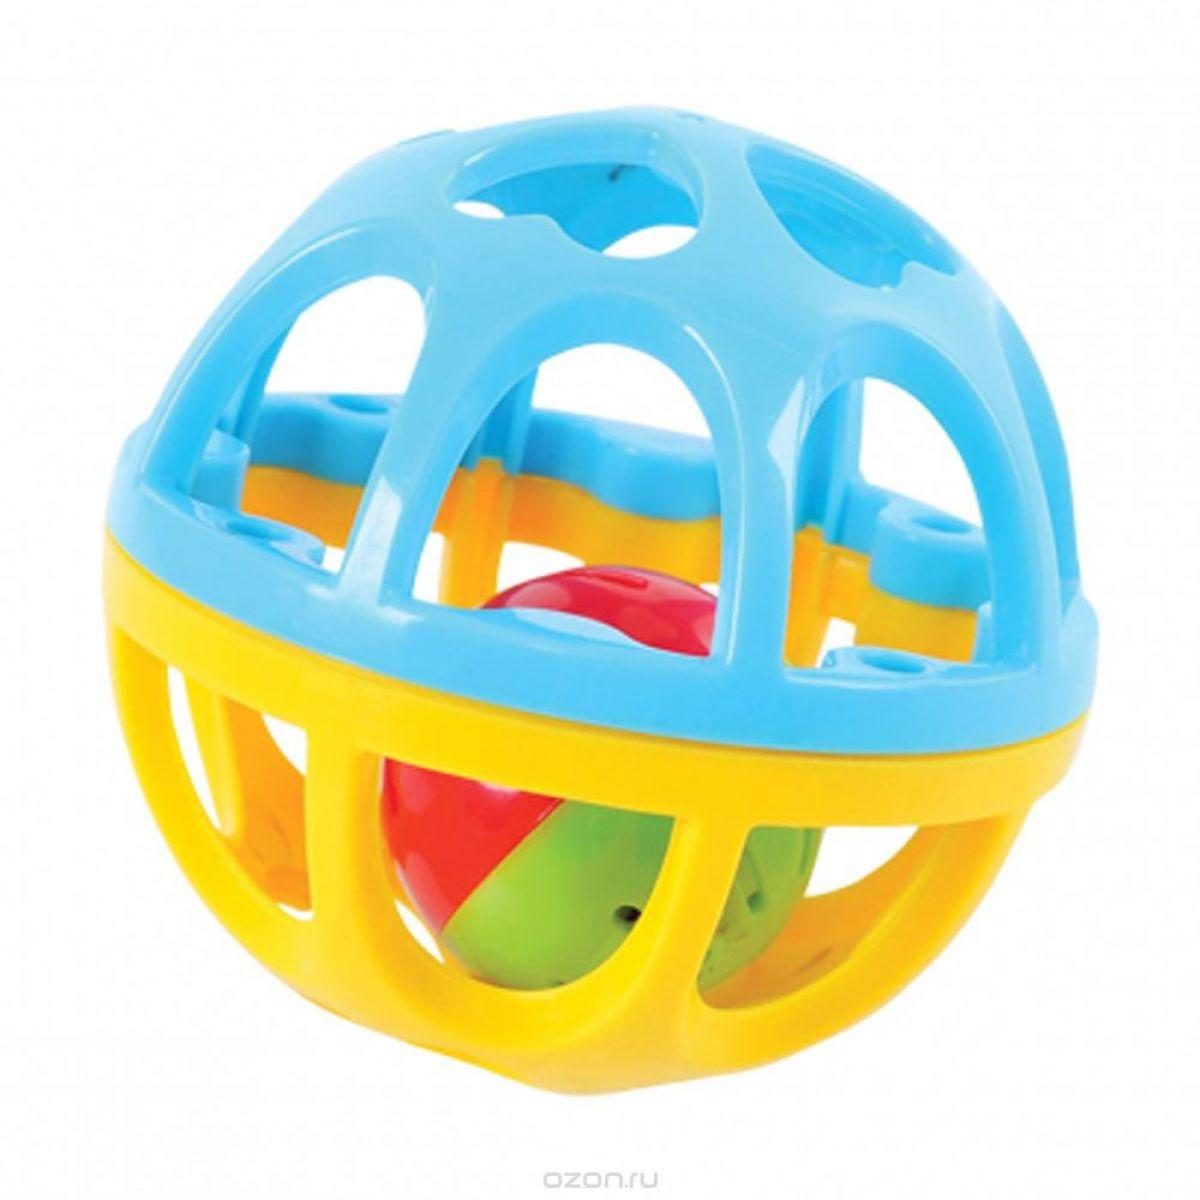 Playgo Chrastící míček Modro-žlutá